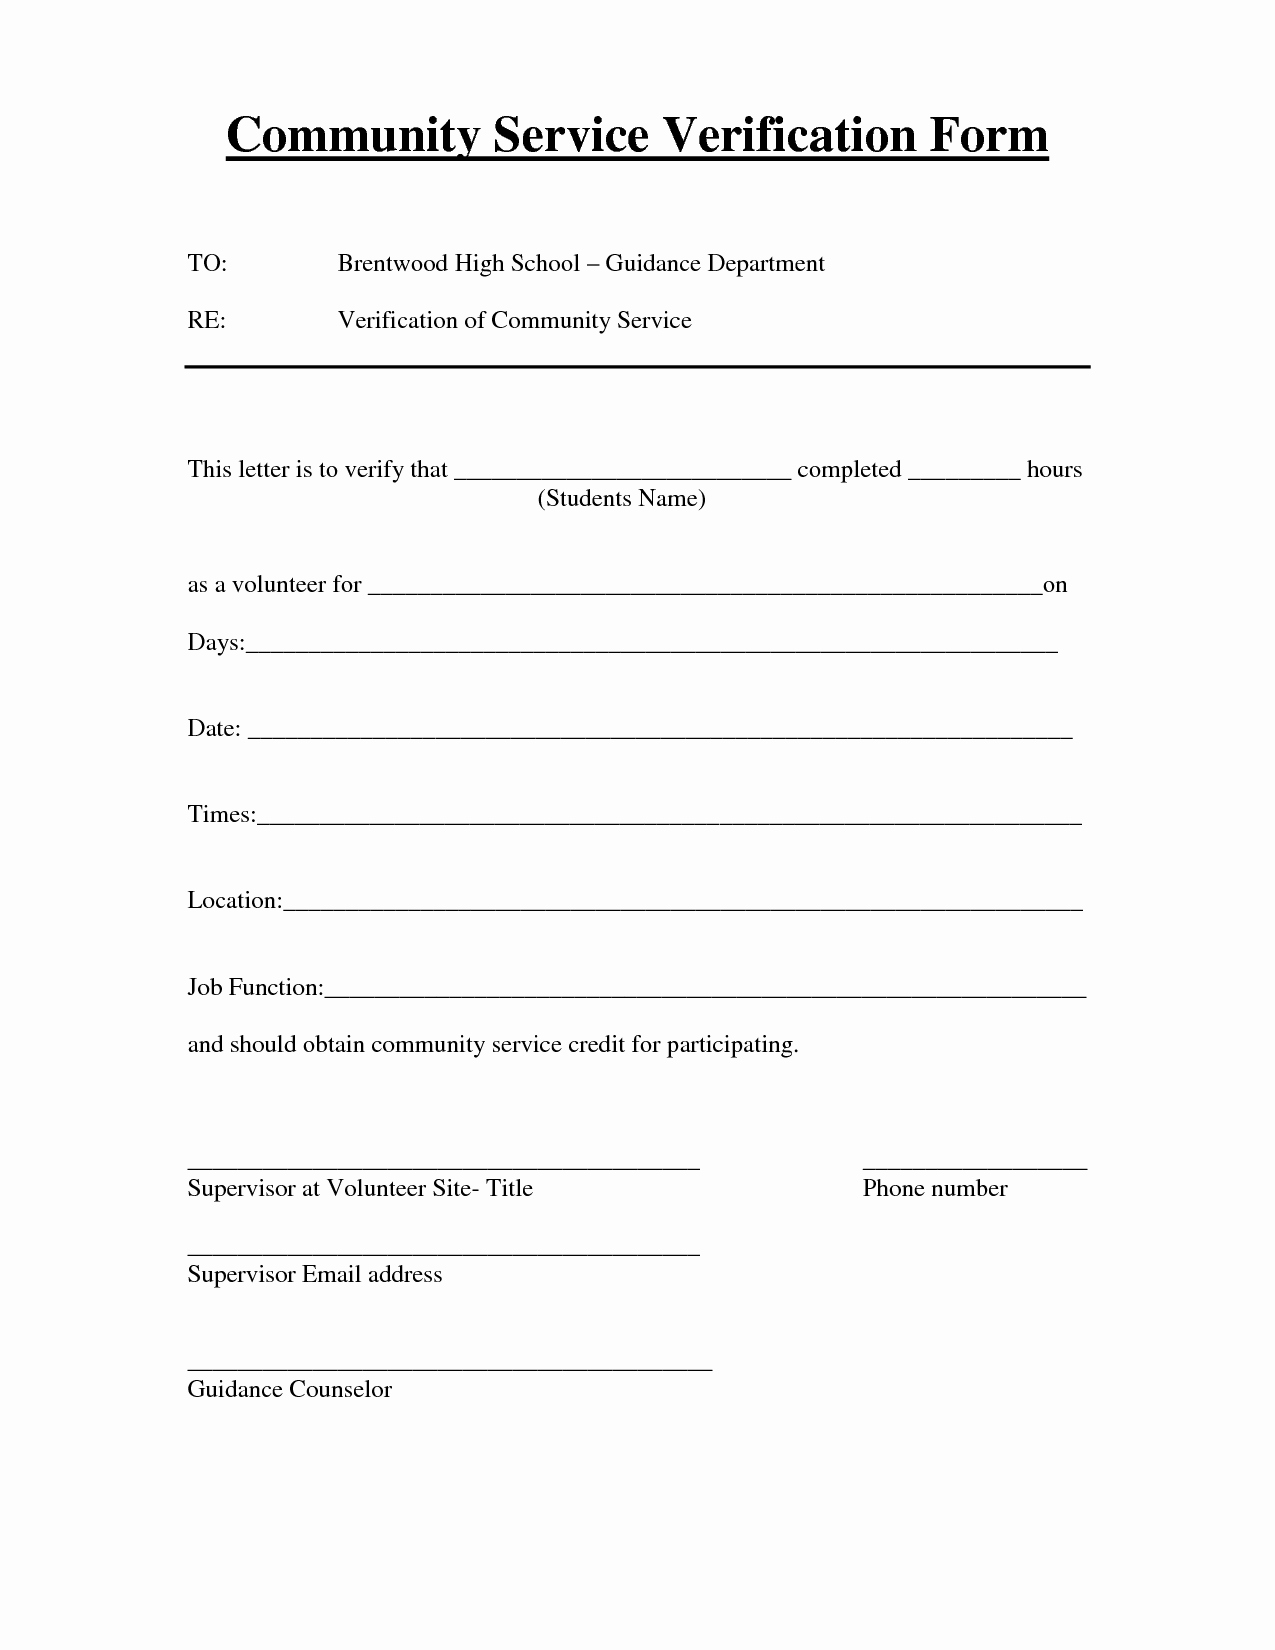 Community Service Verification form Template Inspirational Best S Of Verification Volunteer Hours Letter